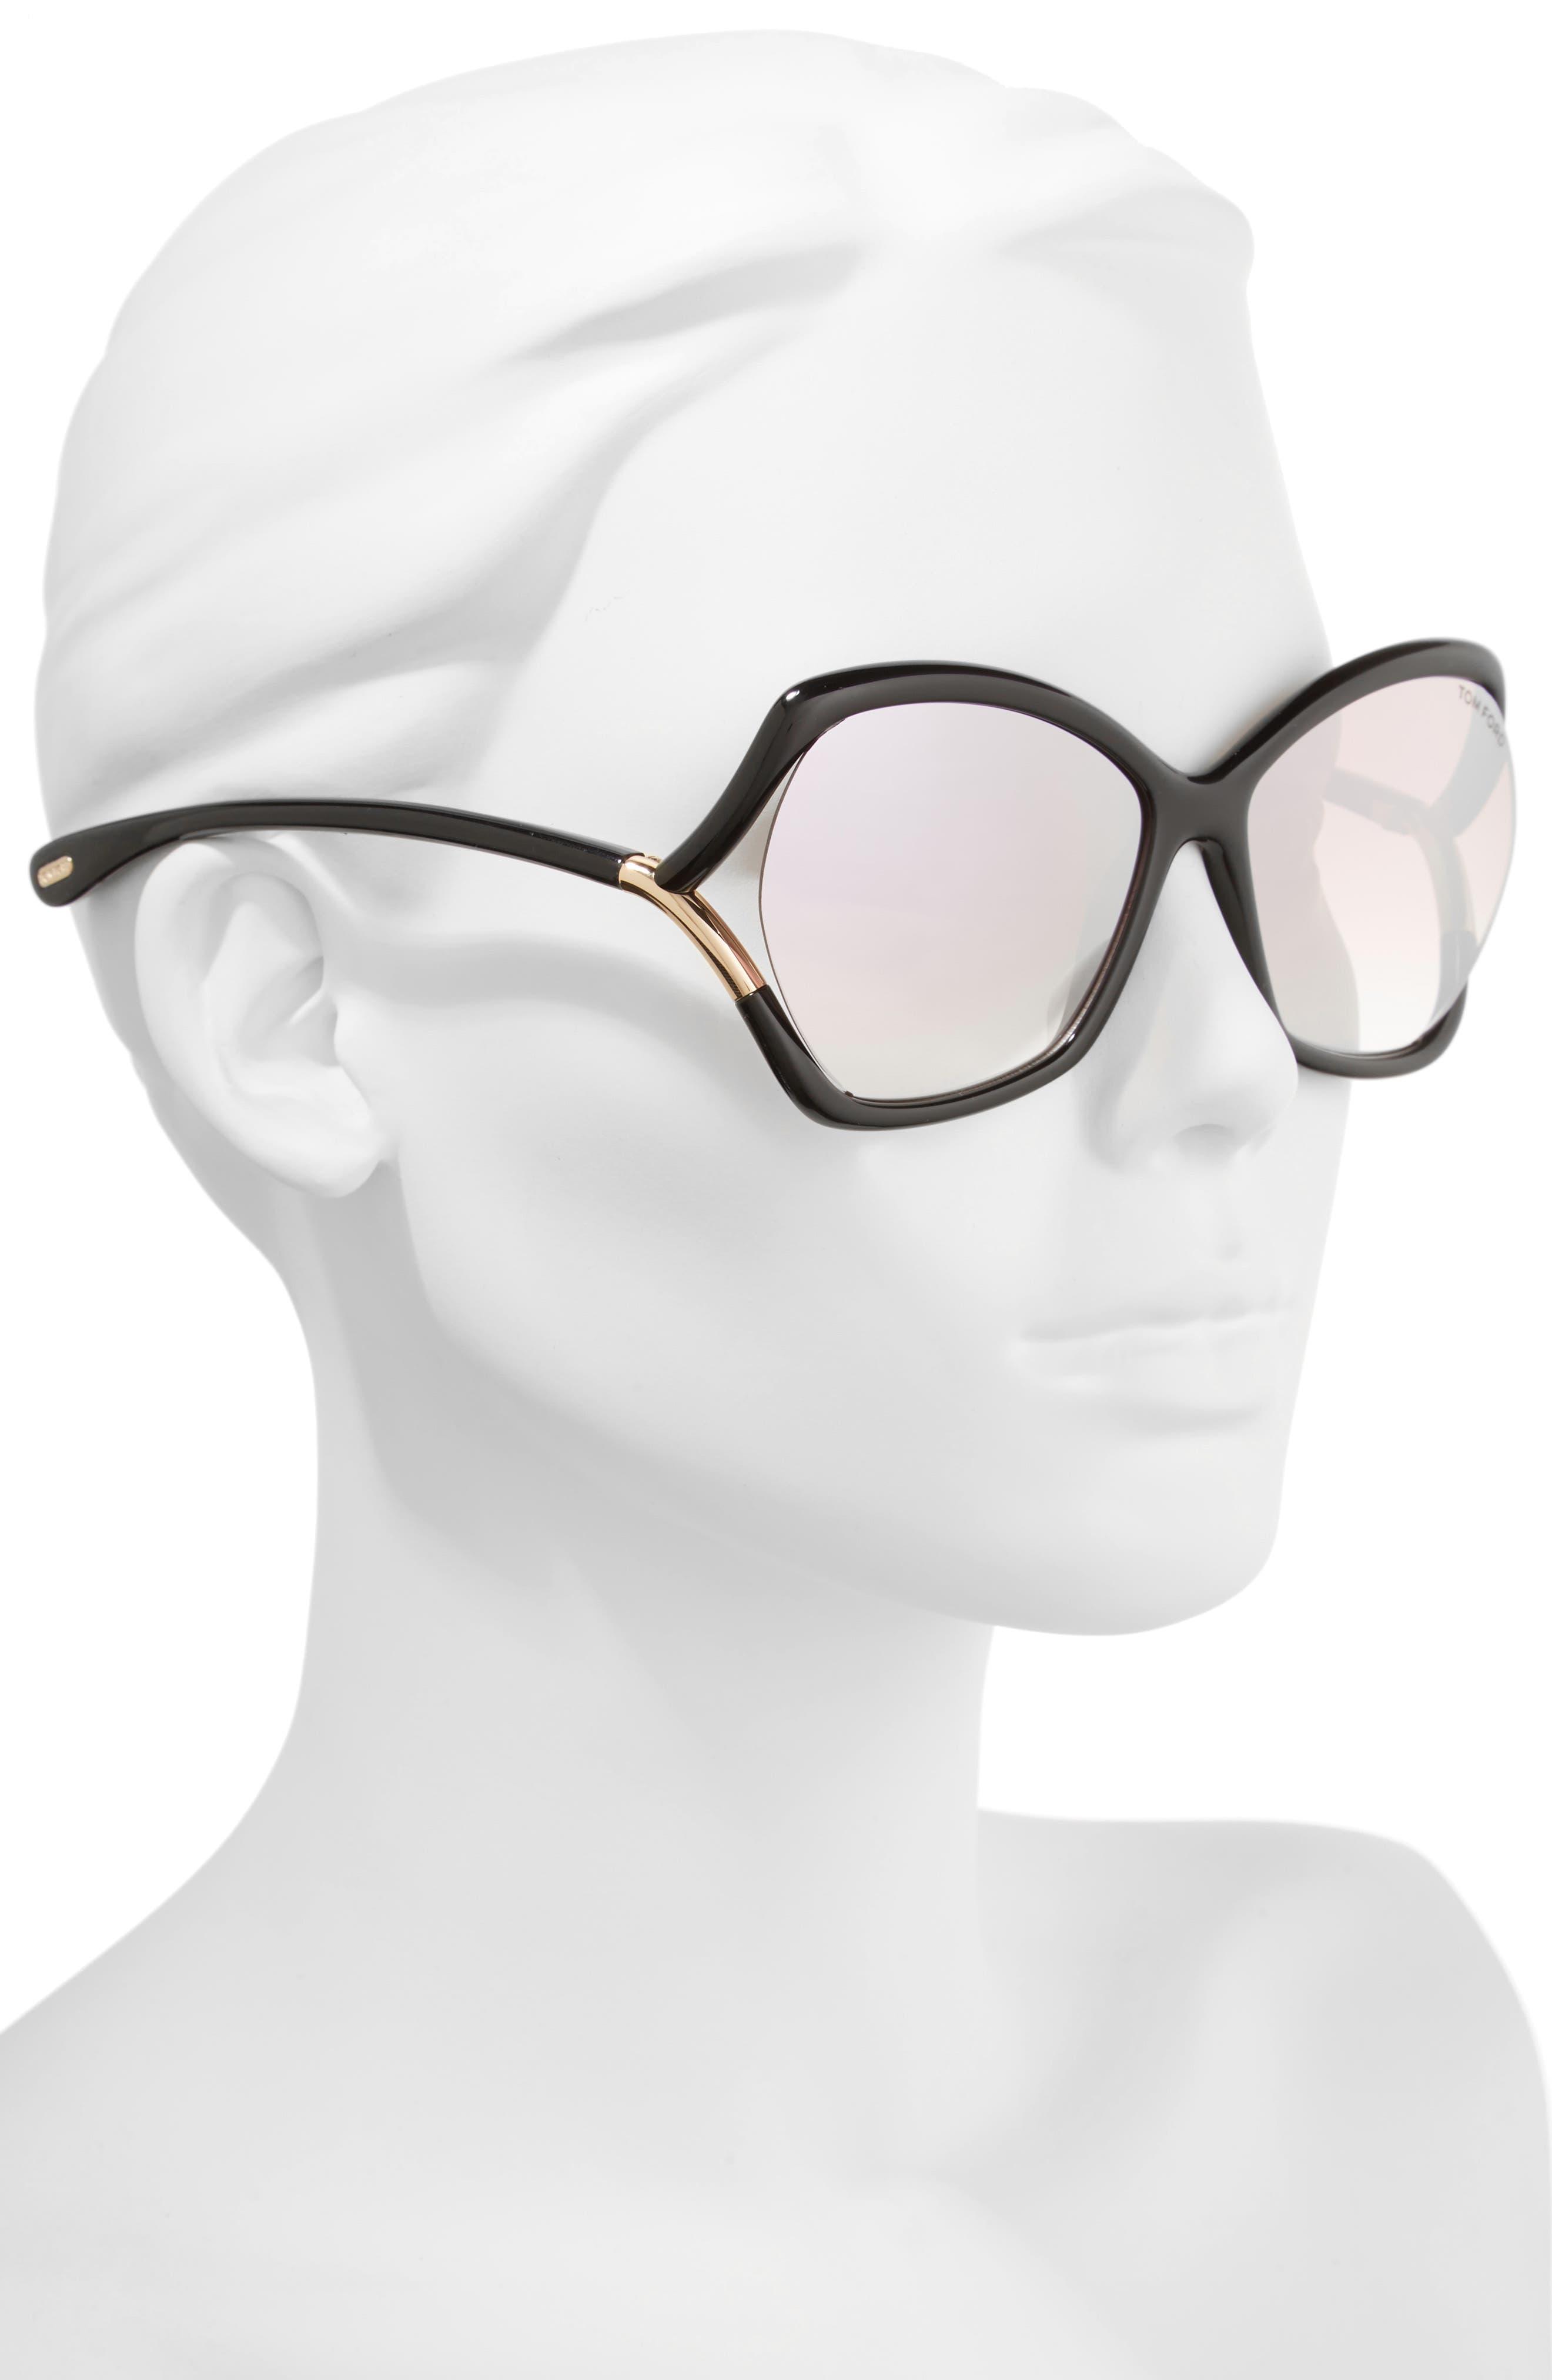 Astrid 61mm Geometric Sunglasses,                             Alternate thumbnail 2, color,                             Black/ Rose Gold/ Pink/ Silver